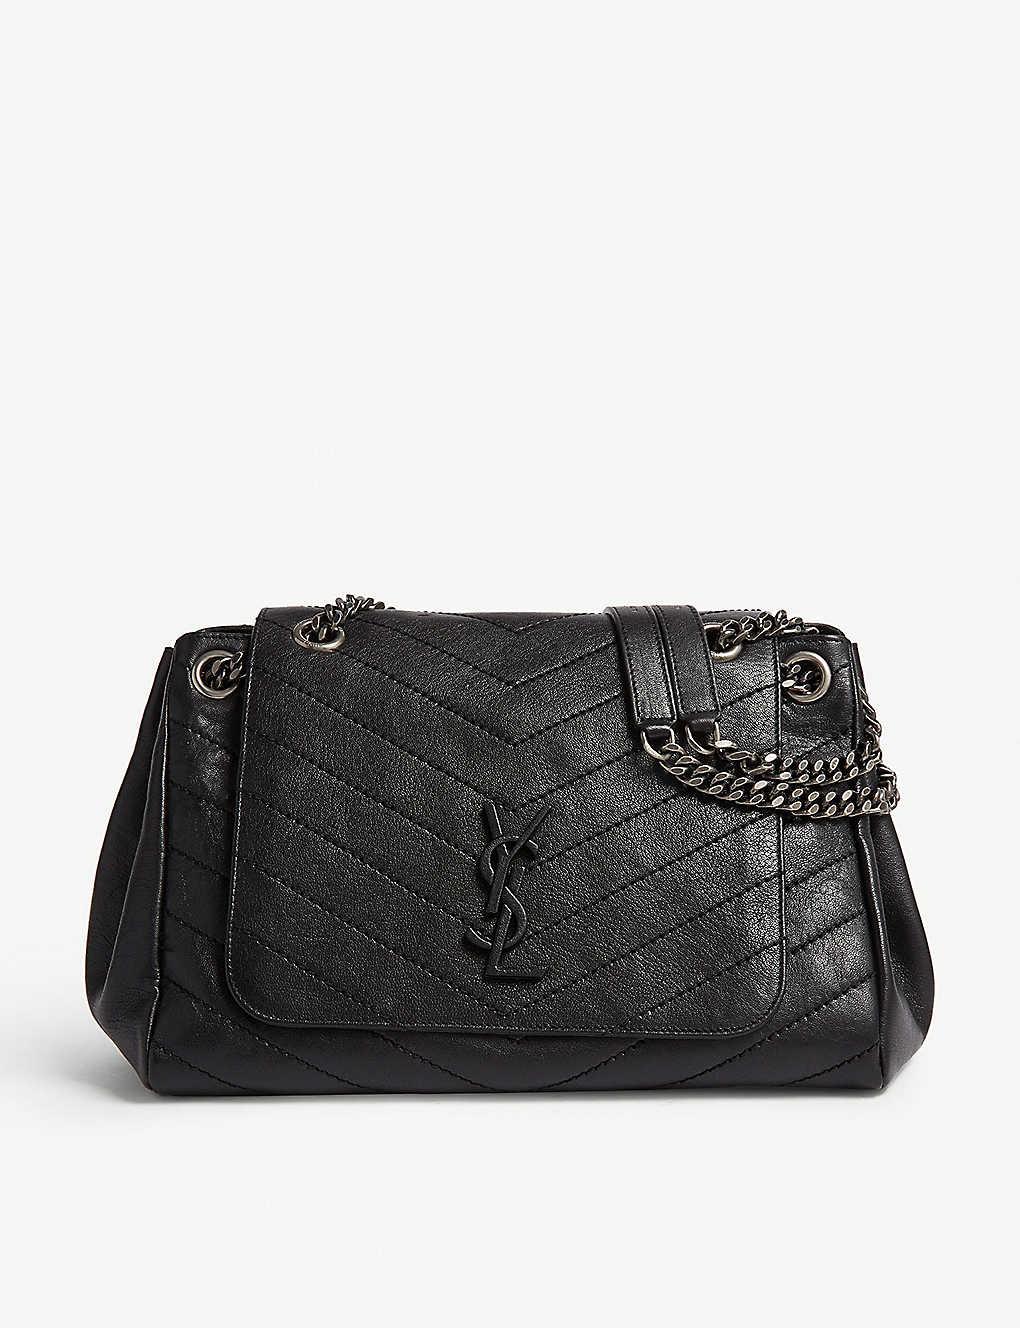 c9770587a3 SAINT LAURENT - Nolita monogram medium leather shoulder bag ...